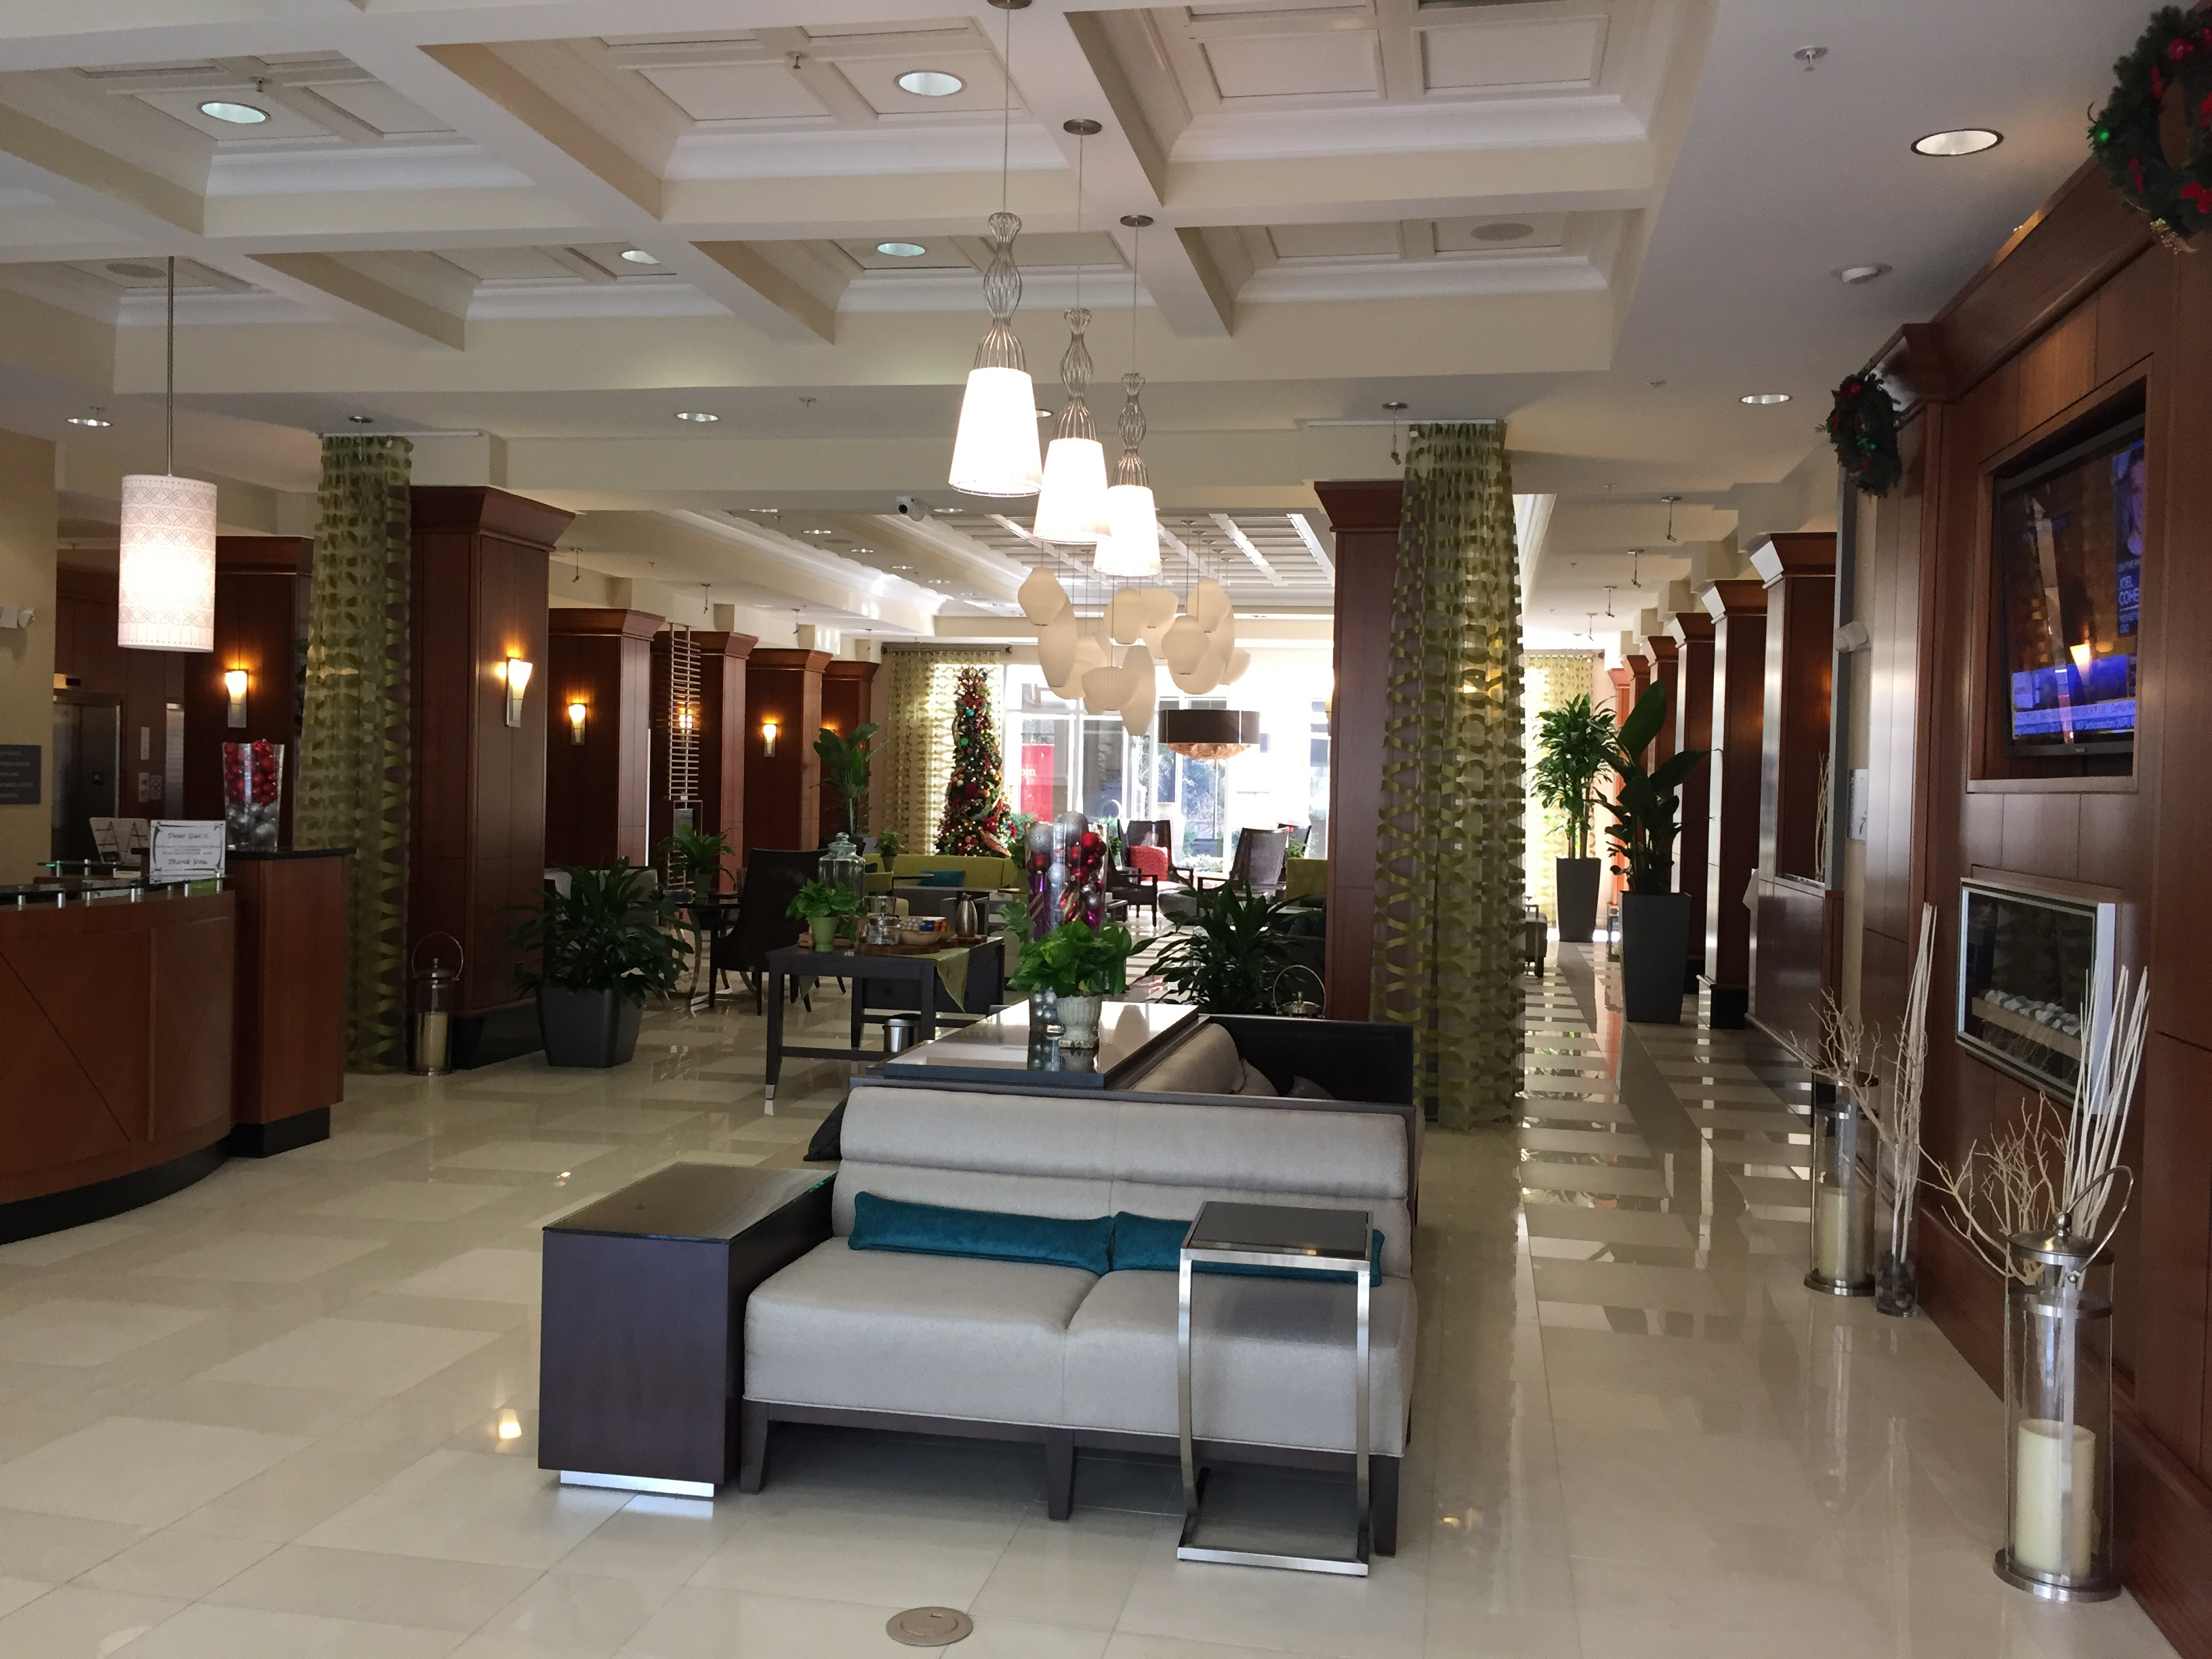 Hilton Garden Inn Reveals New Hotel In Dalton